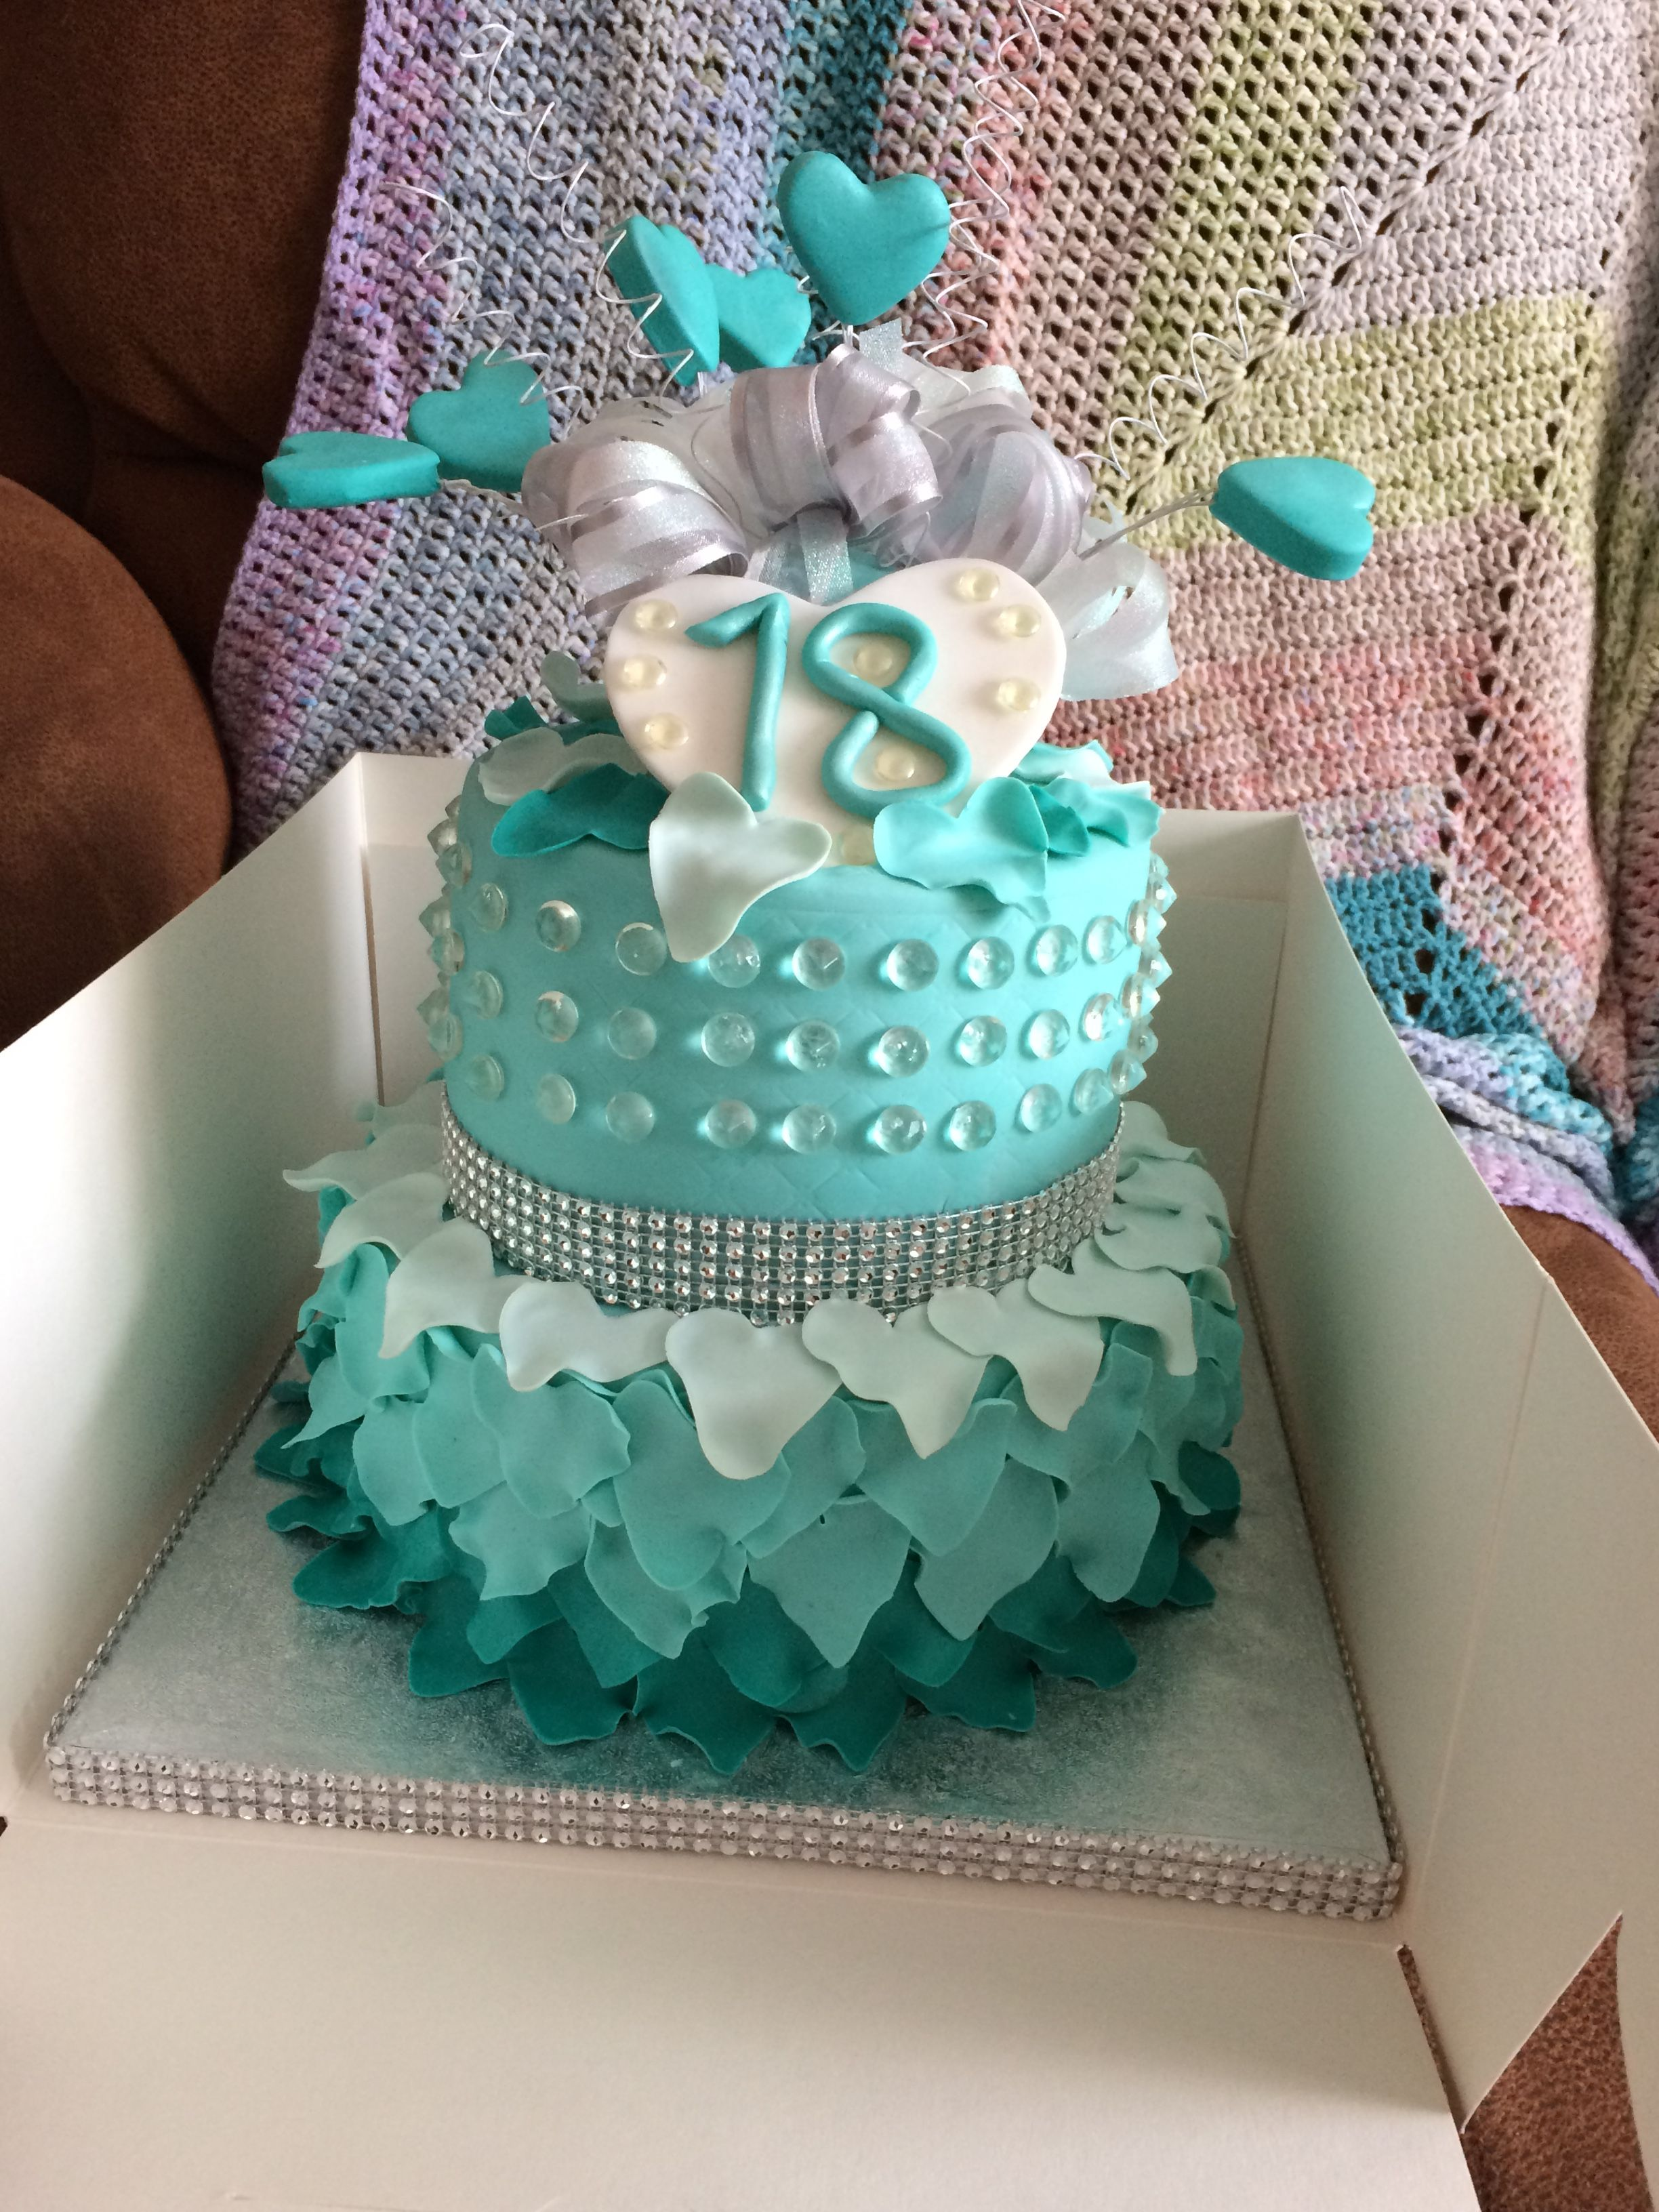 2nd teal 18th birthday cake Wedding anniversary cakes